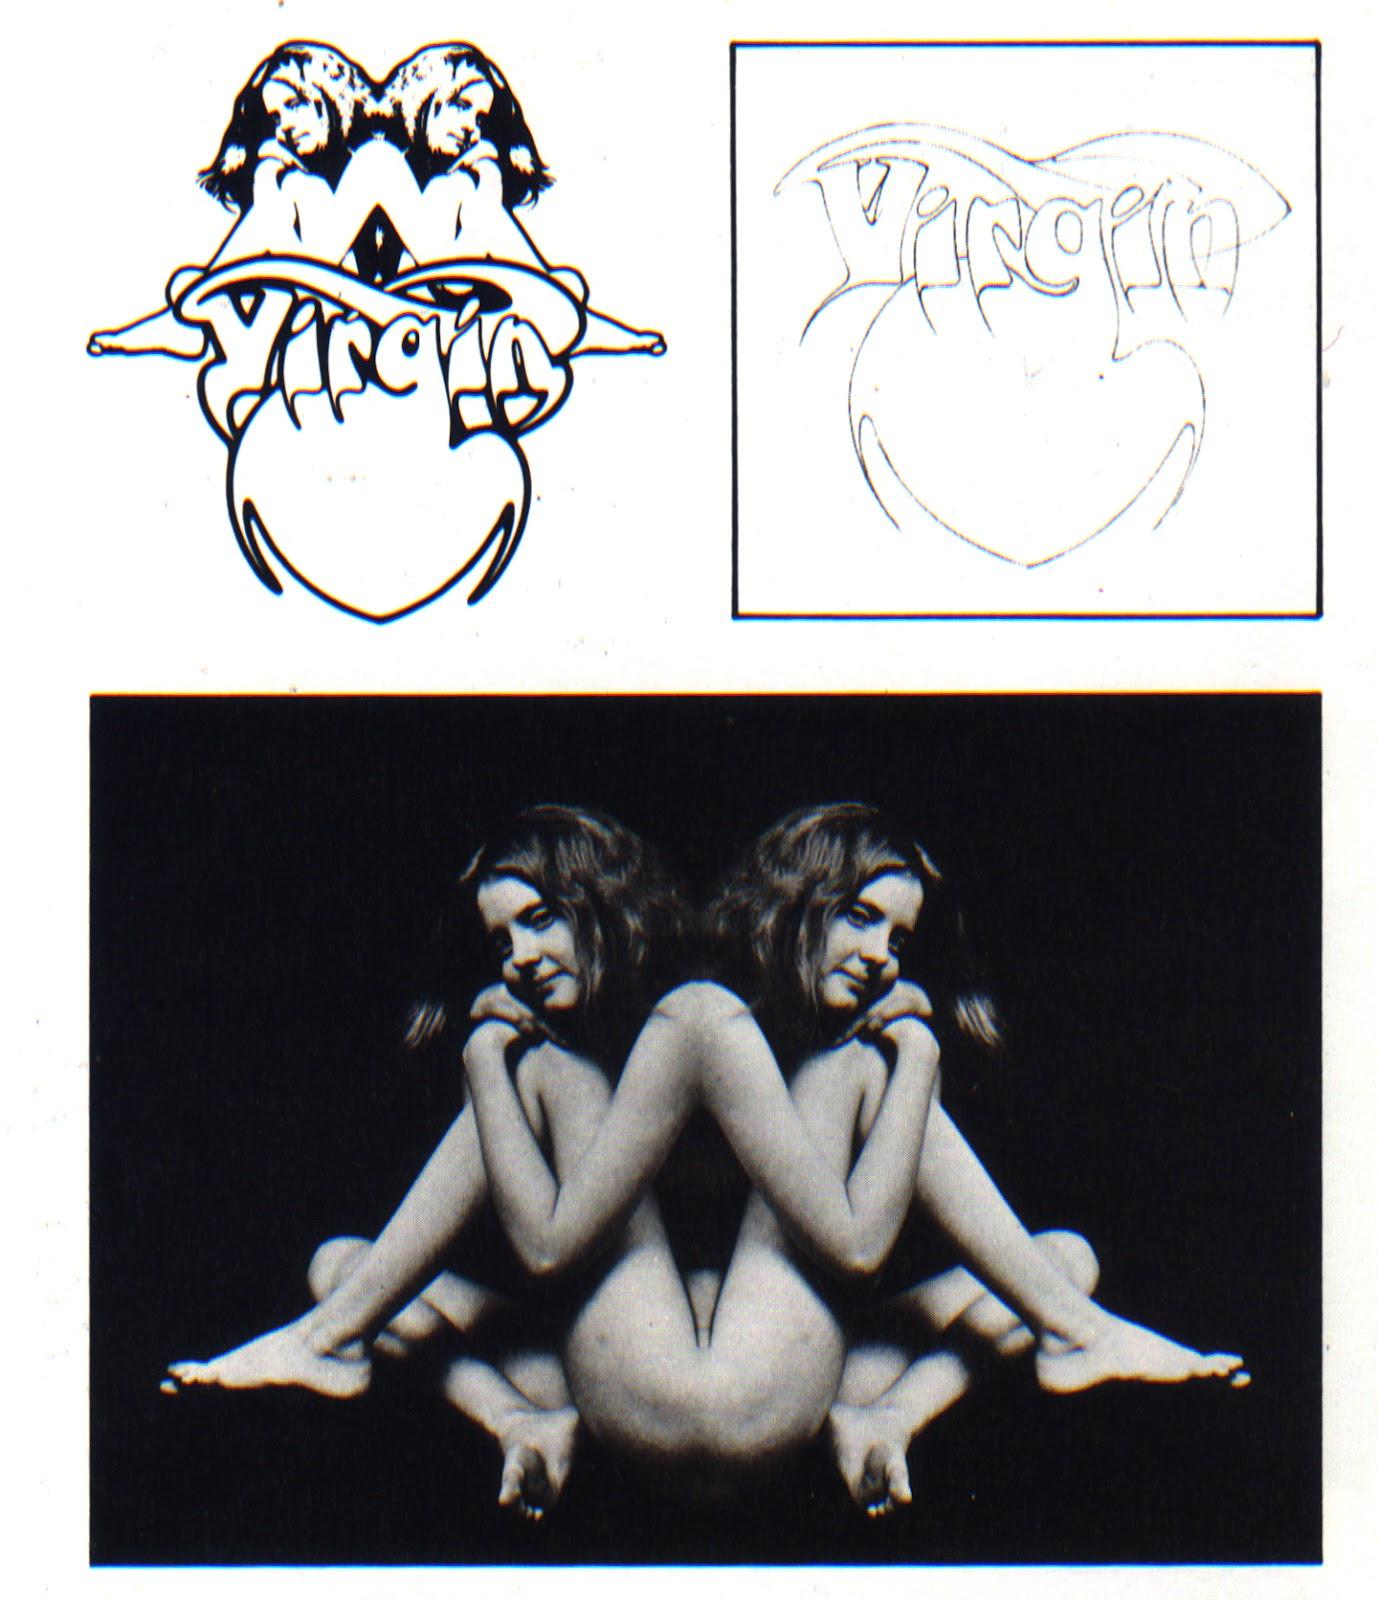 Advise you virgin records logo too seemed